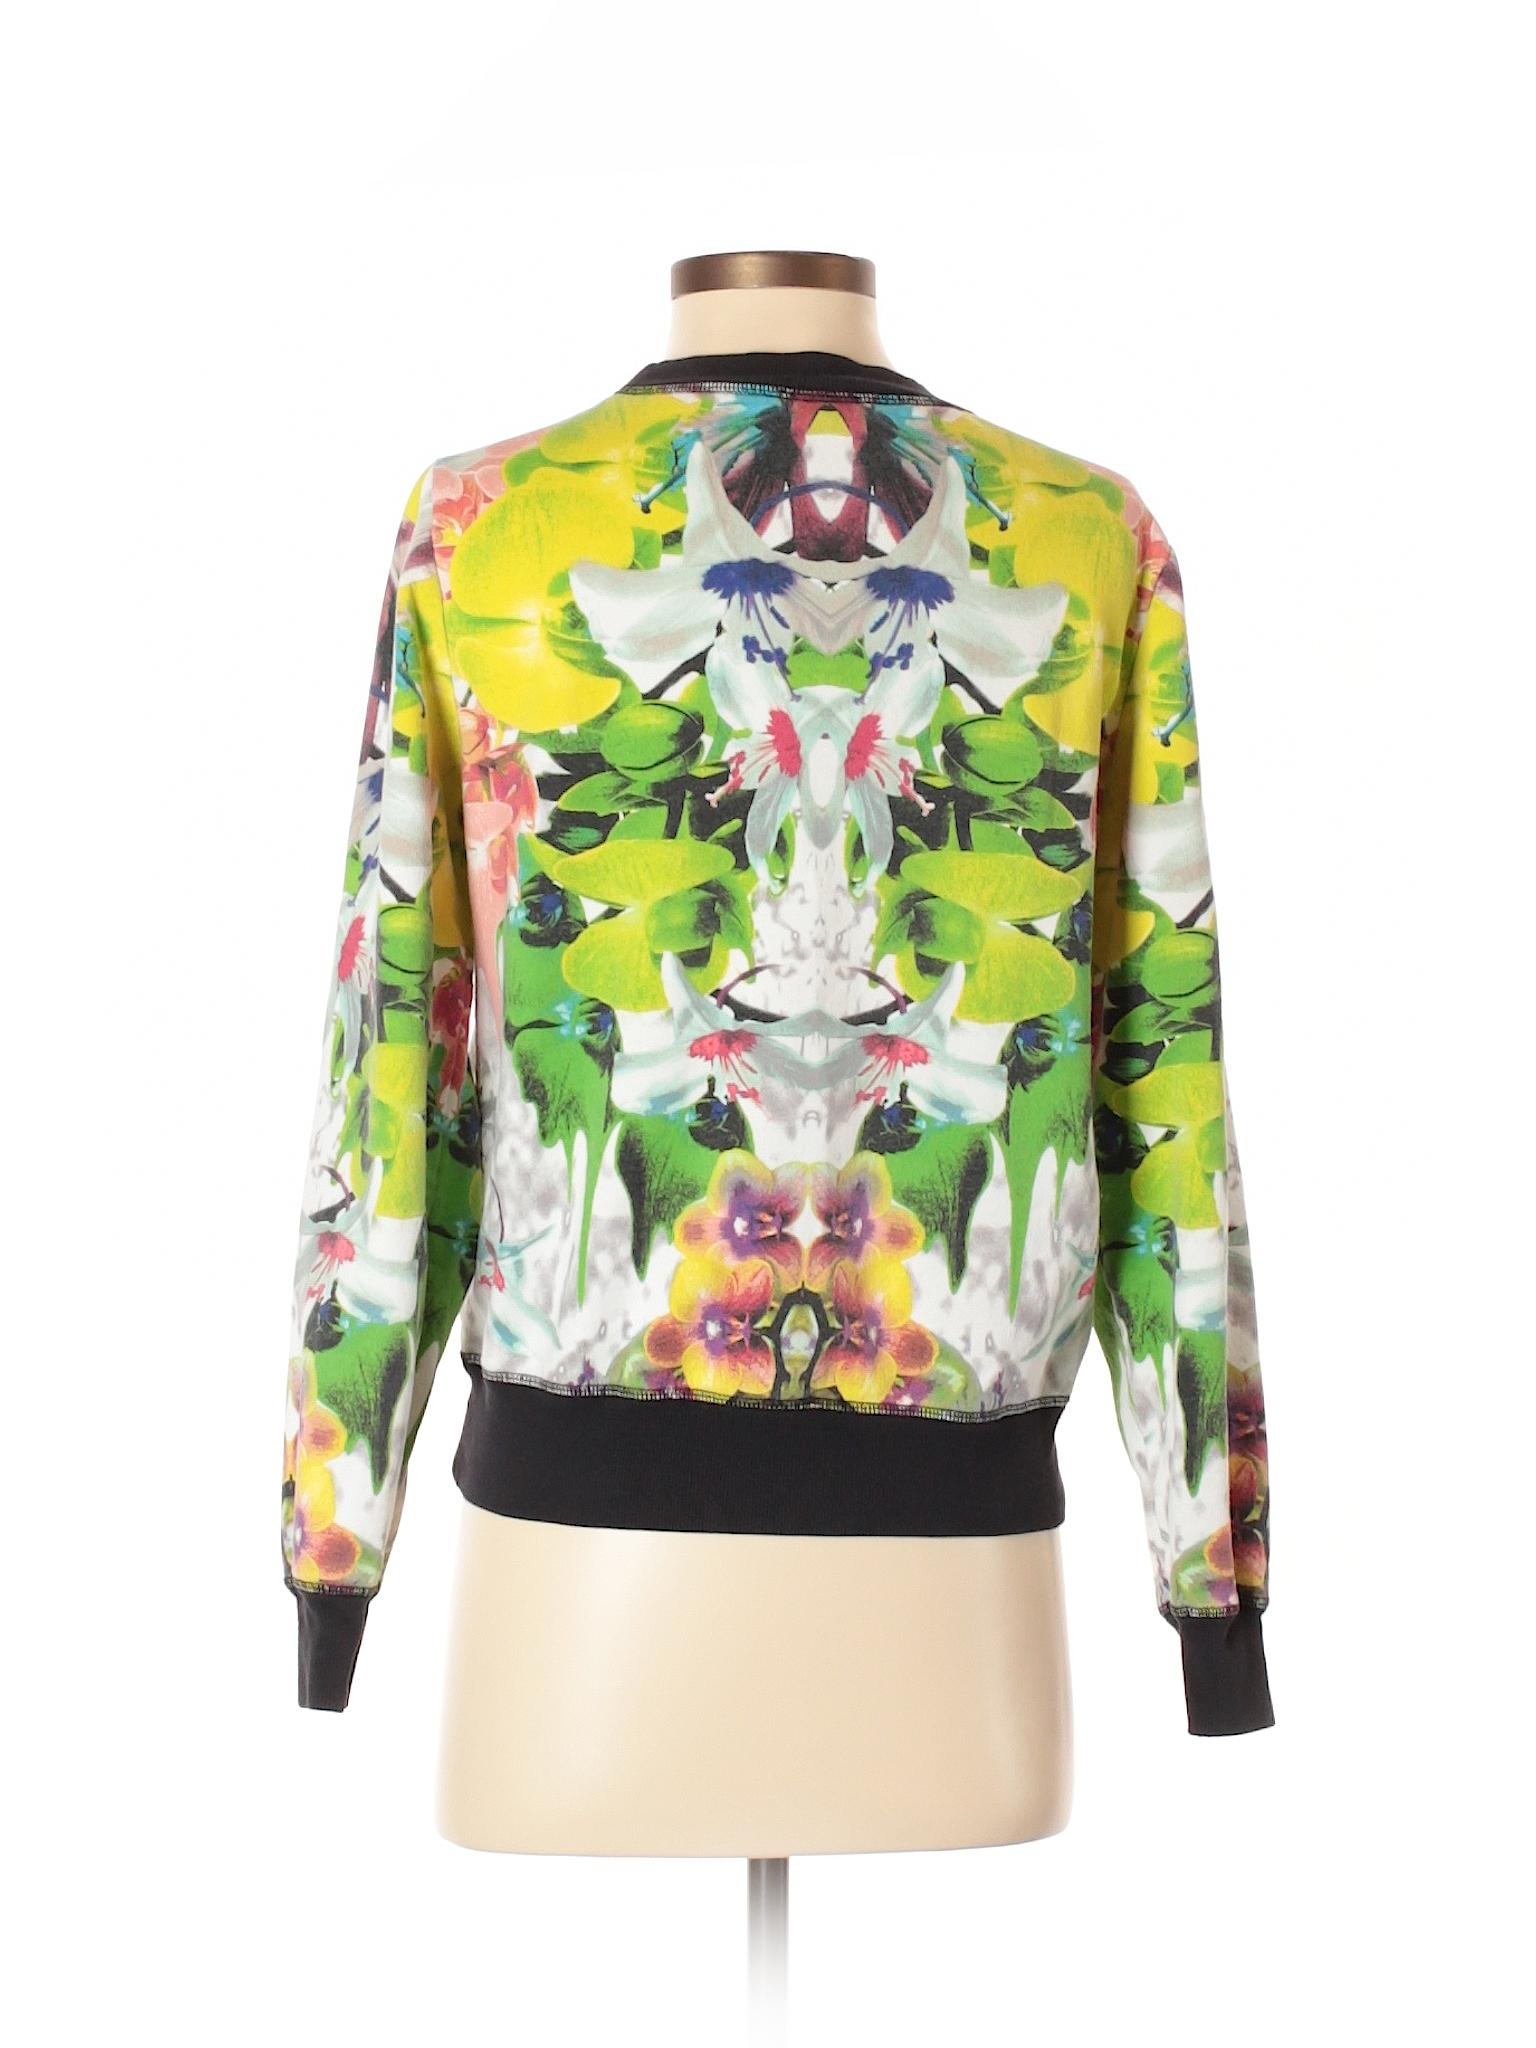 2236862f2 Prabal Gurung for Neiman Marcus + Target Print Green Sweatshirt Size ...